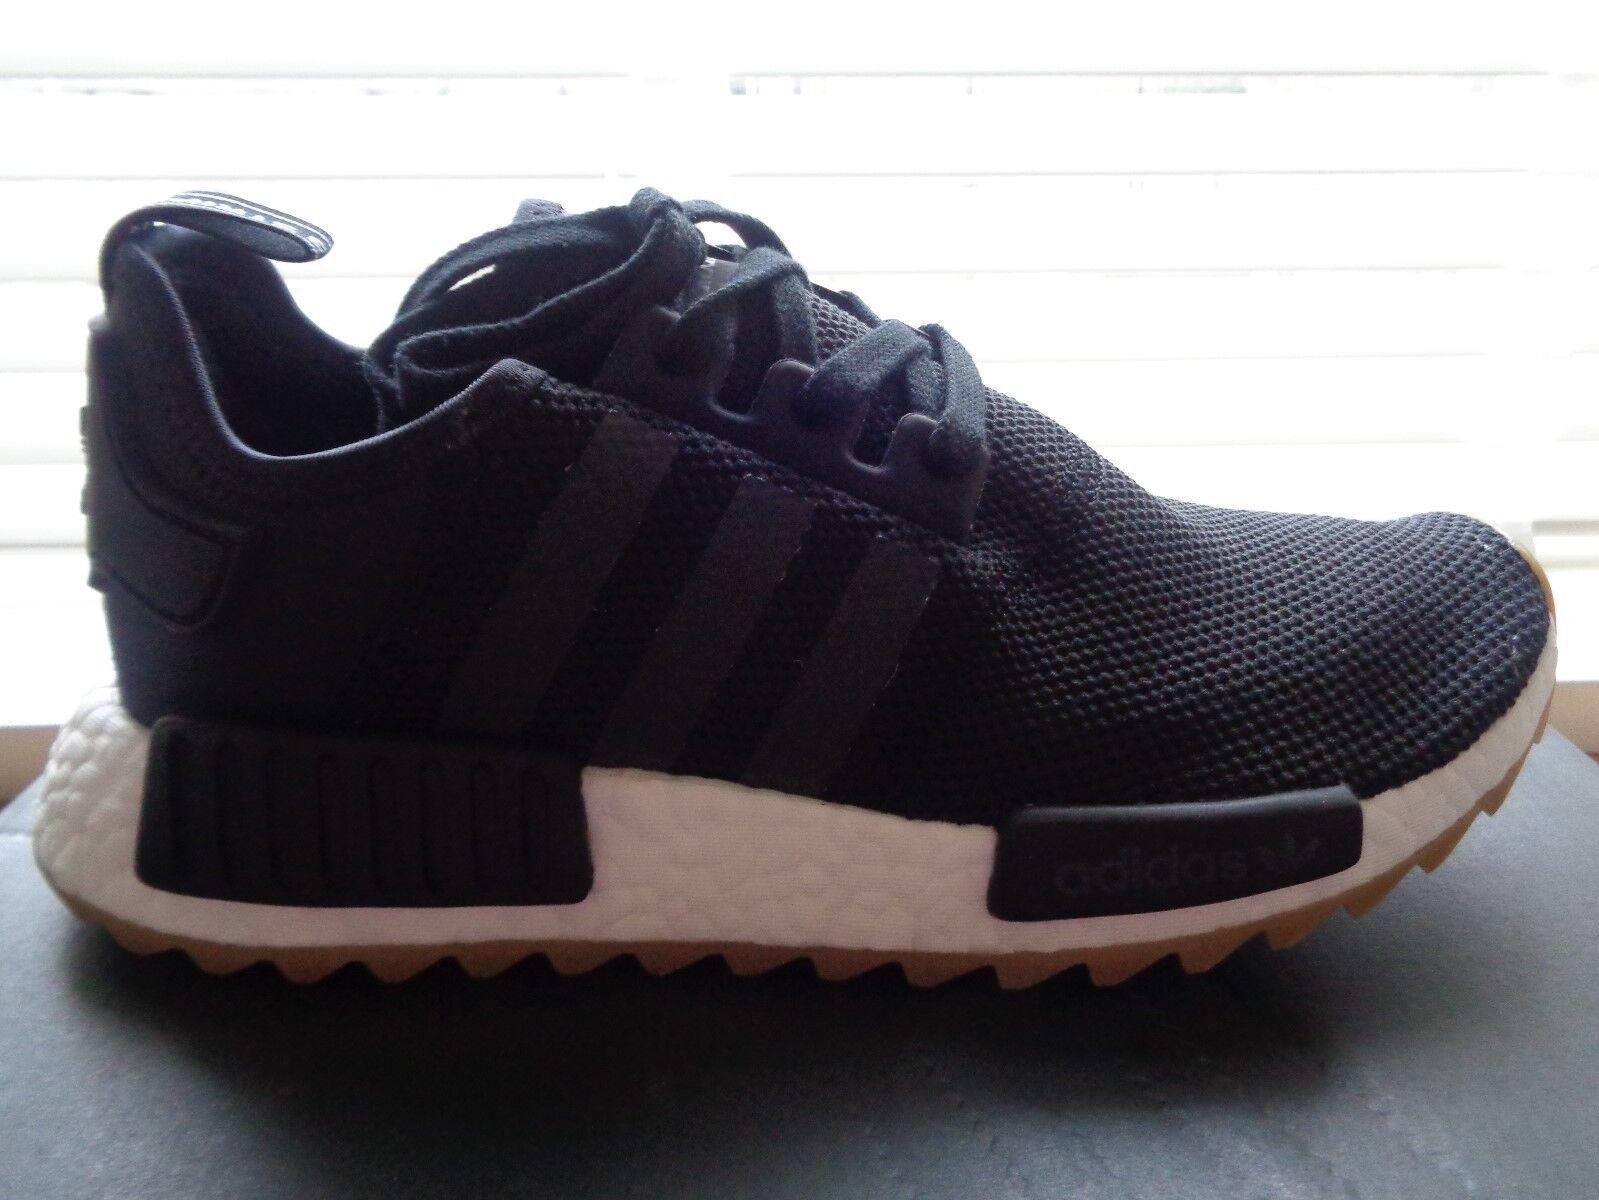 Adidas originals NMD_R1 Trail Damenss trainers S81046 uk 4.5 eu 37 1/3 us 5 NEW